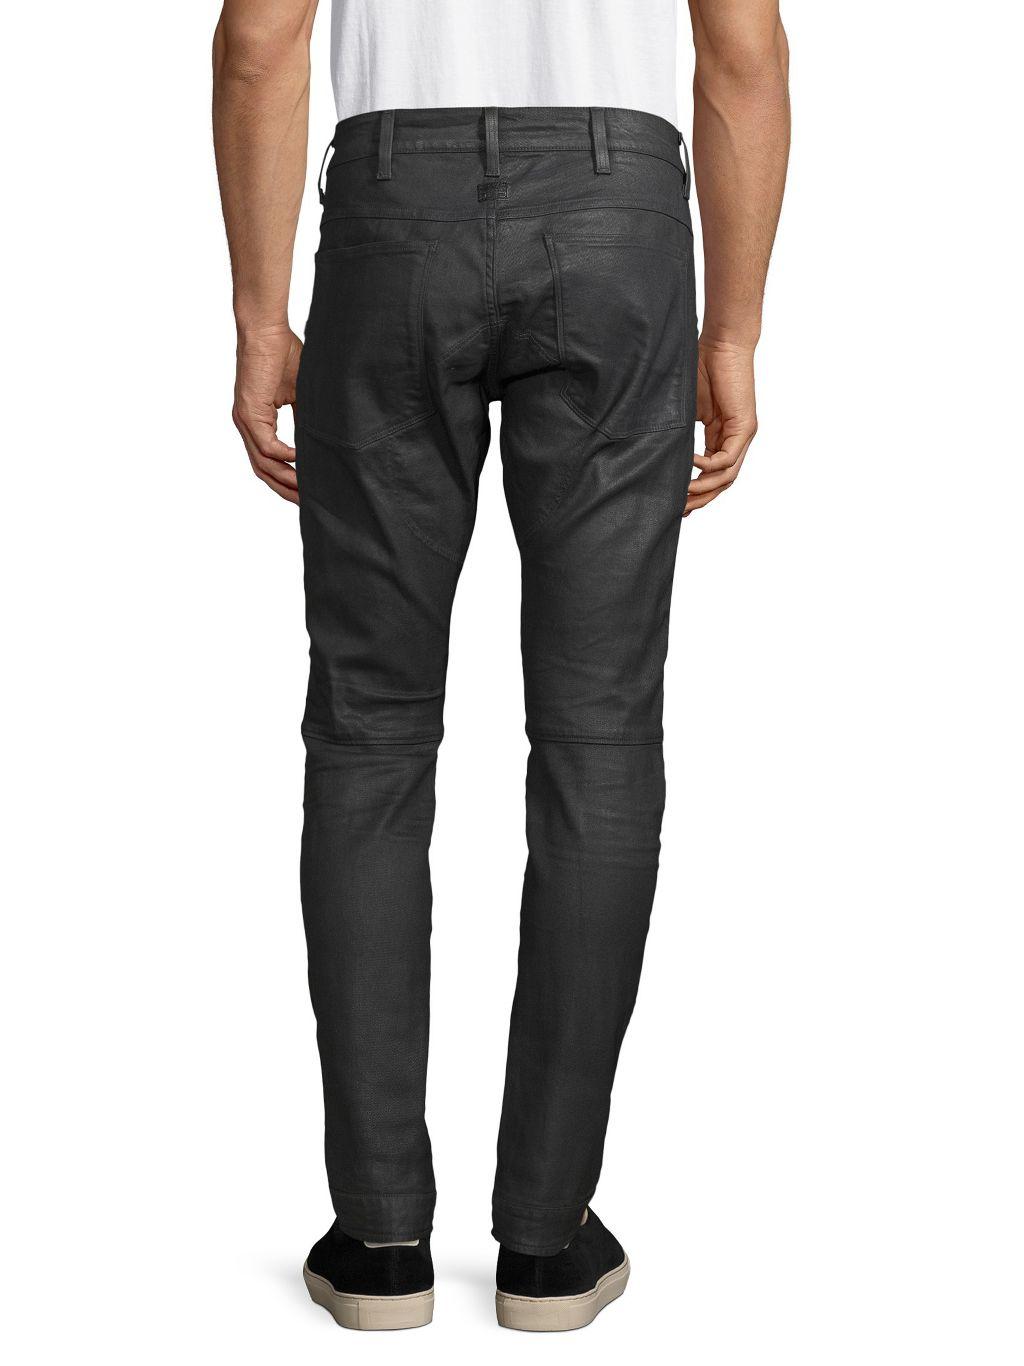 G-Star RAW Coated Skinny Moto Jeans